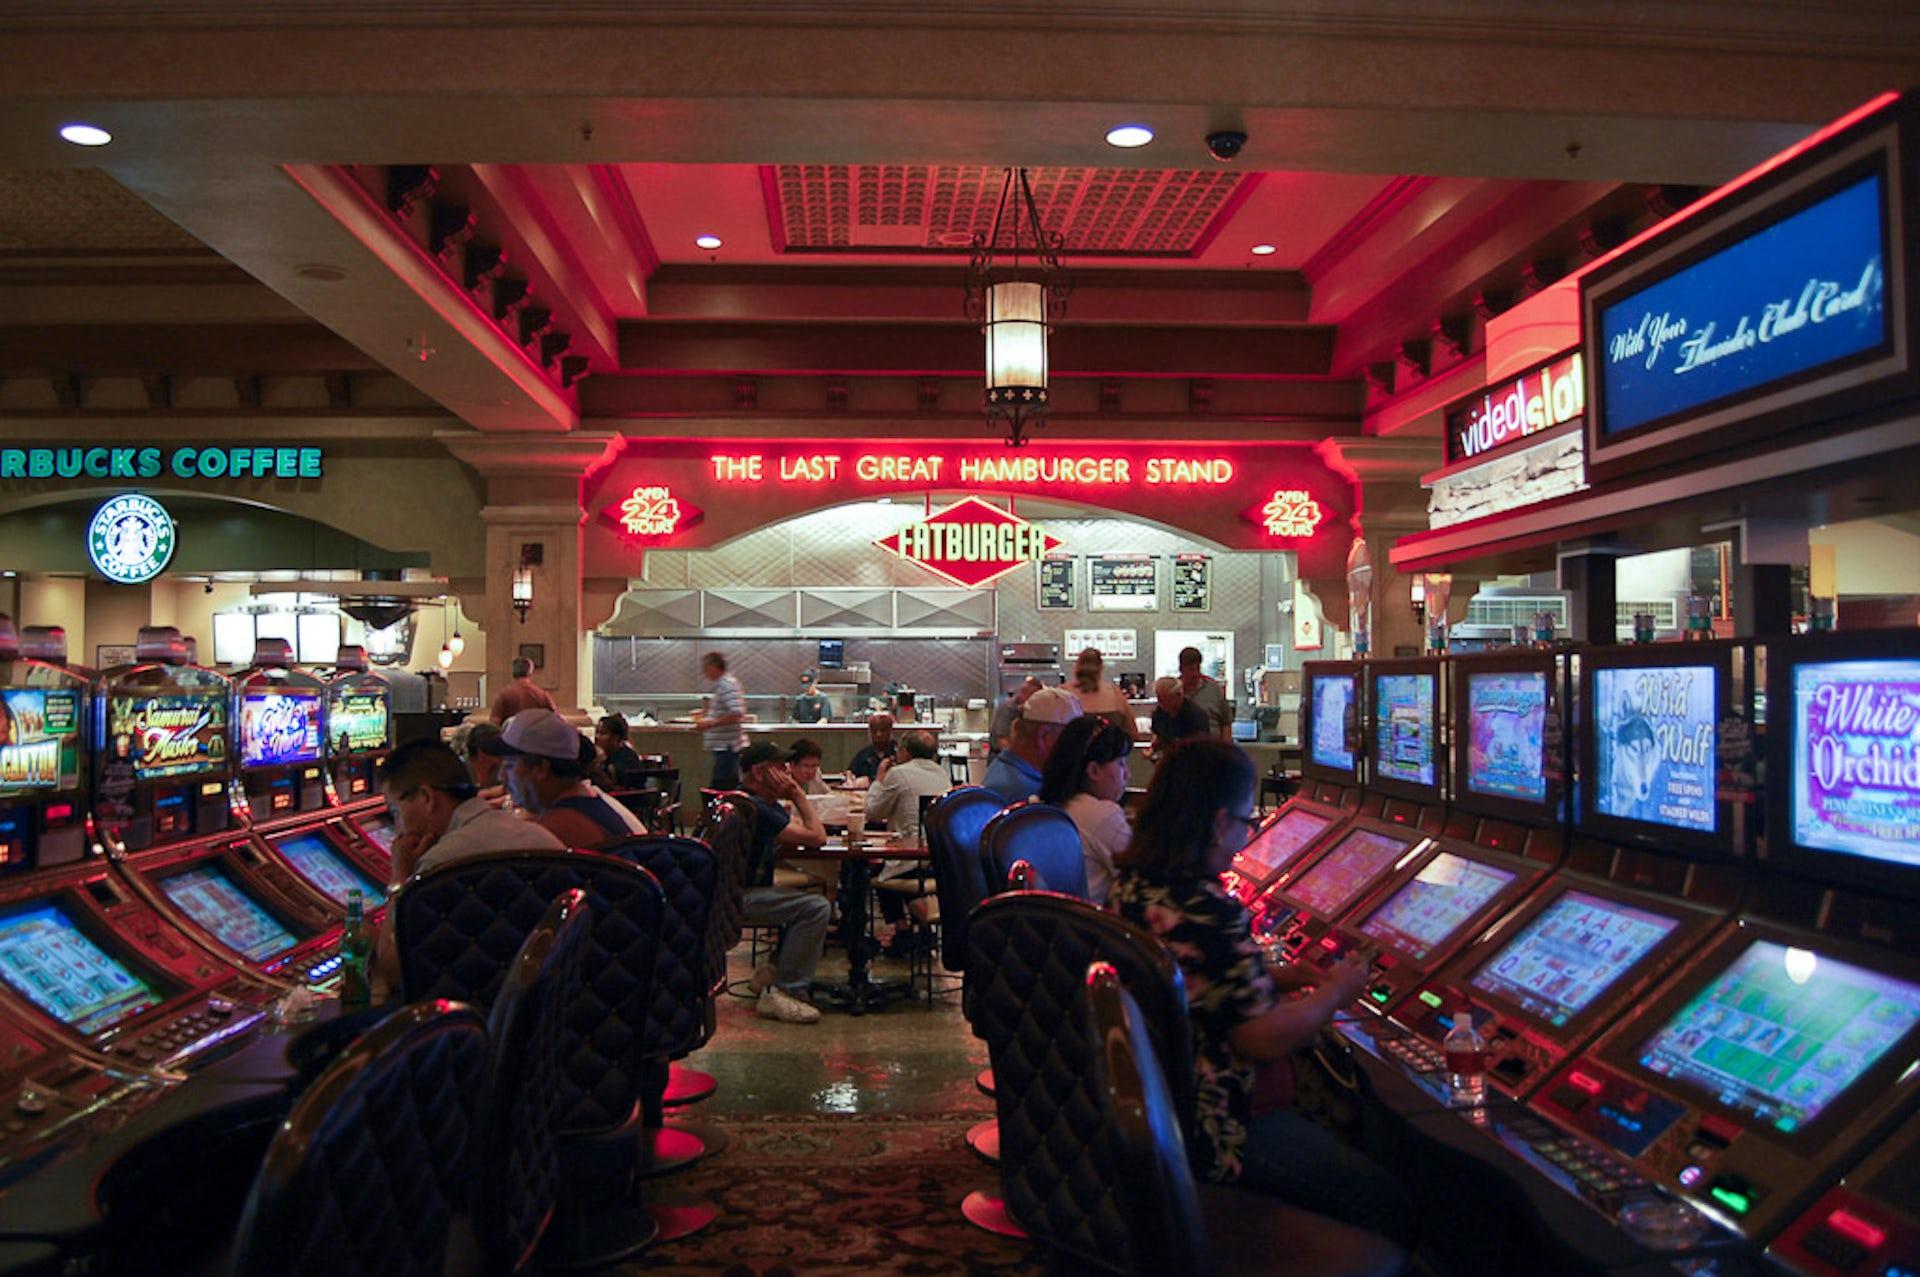 Linfluence Des Casino Tpe